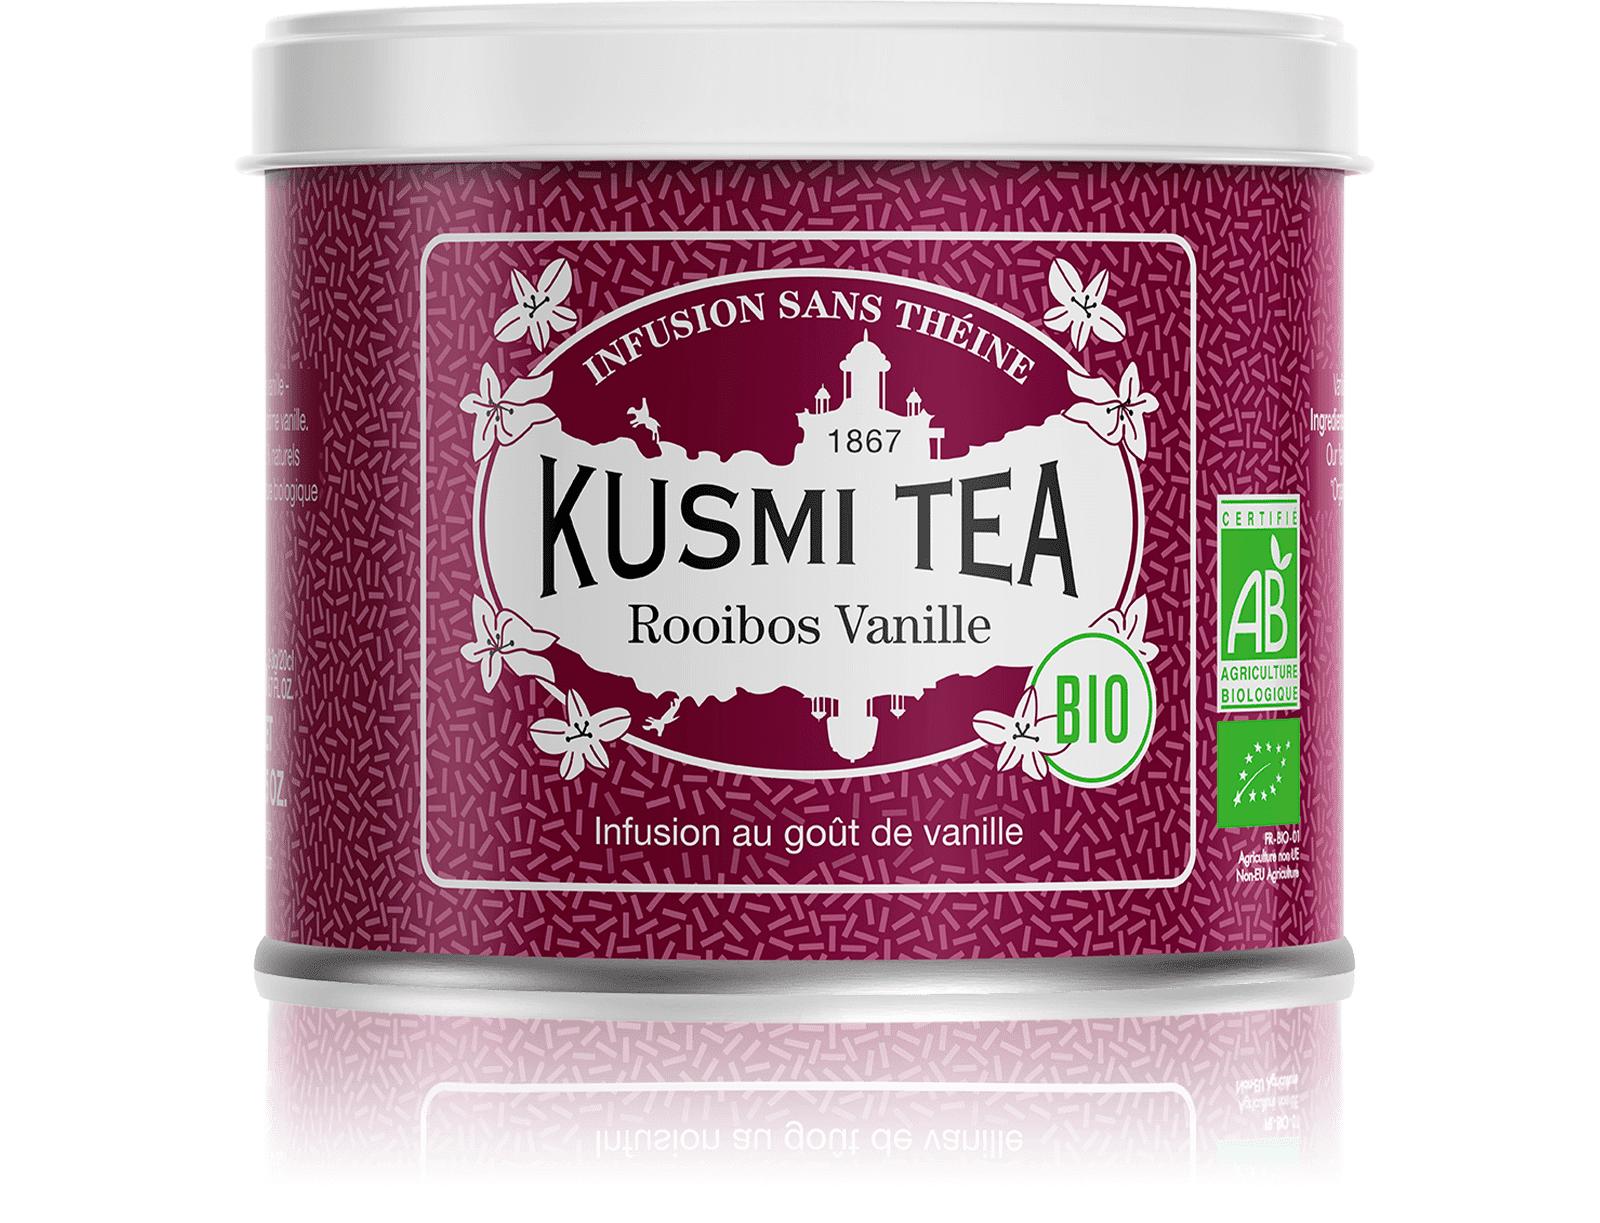 KUSMI TEA Rooibos Vanille (Infusion bio) - Infusion au goût de vanille - Boite à thé en vrac - Kusmi Tea